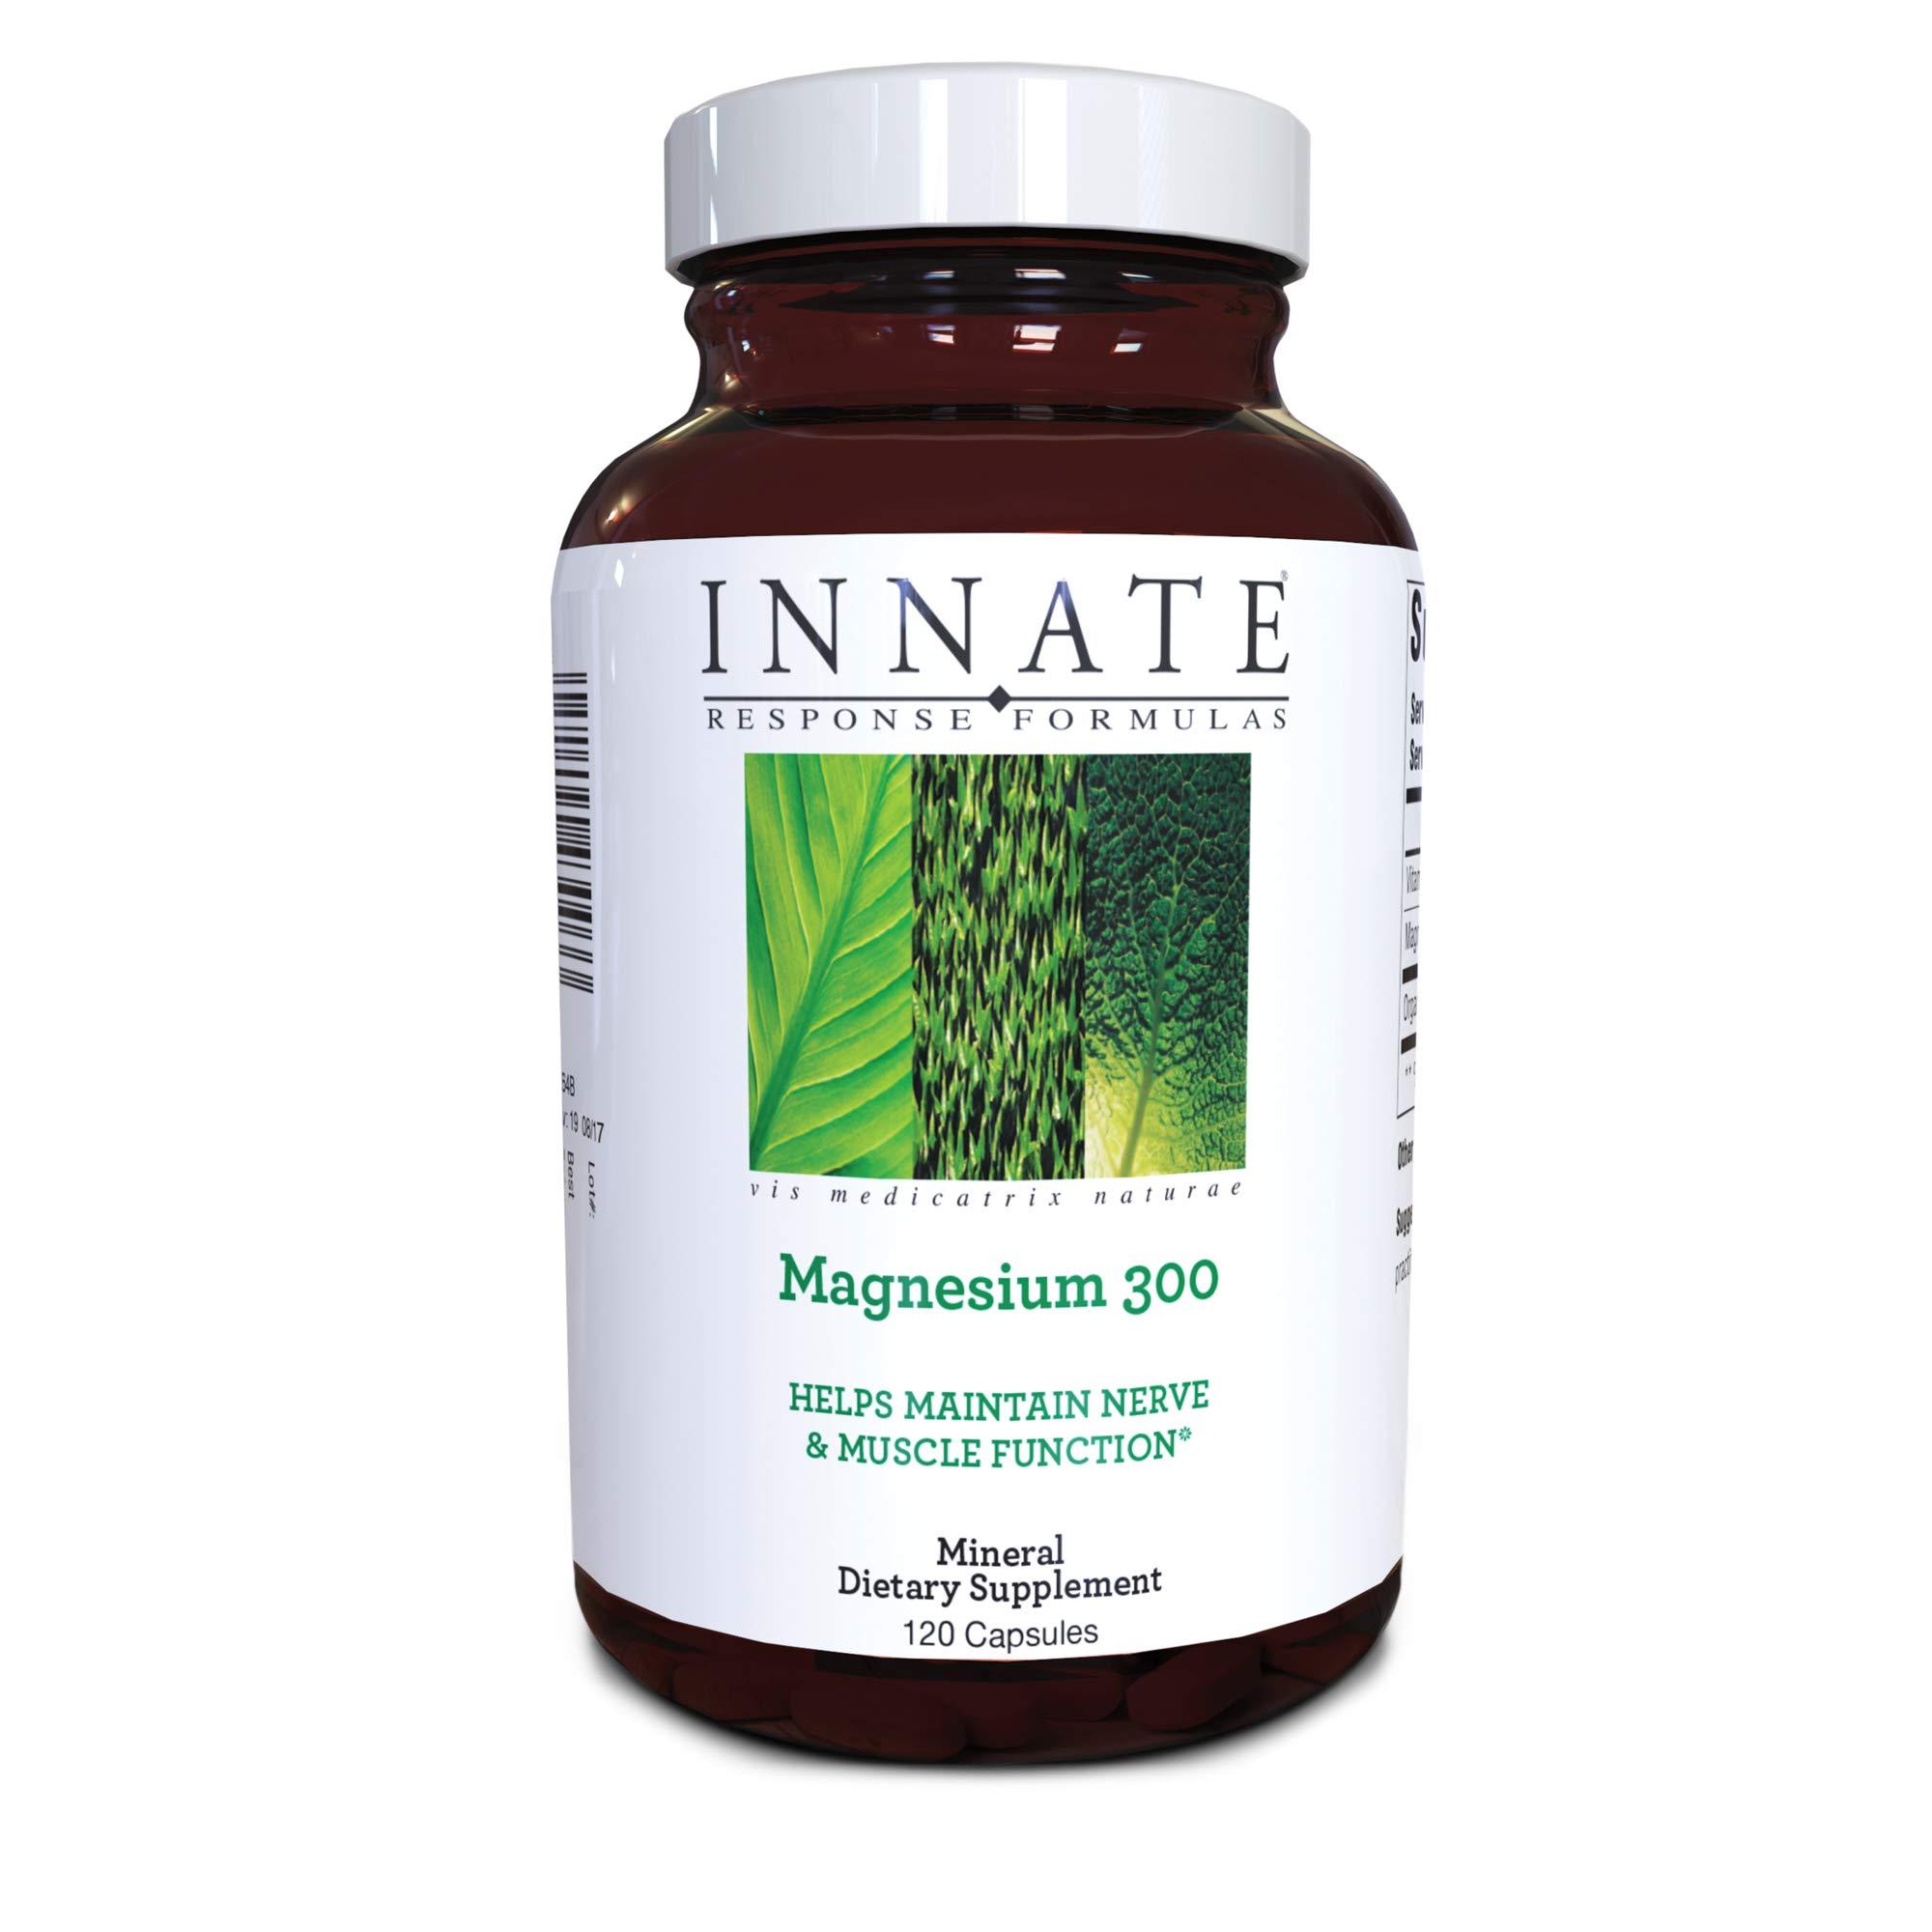 INNATE Response Formulas, Magnesium 300, Mineral Supplement, Vegetarian, 120 Capsules (60 Servings)